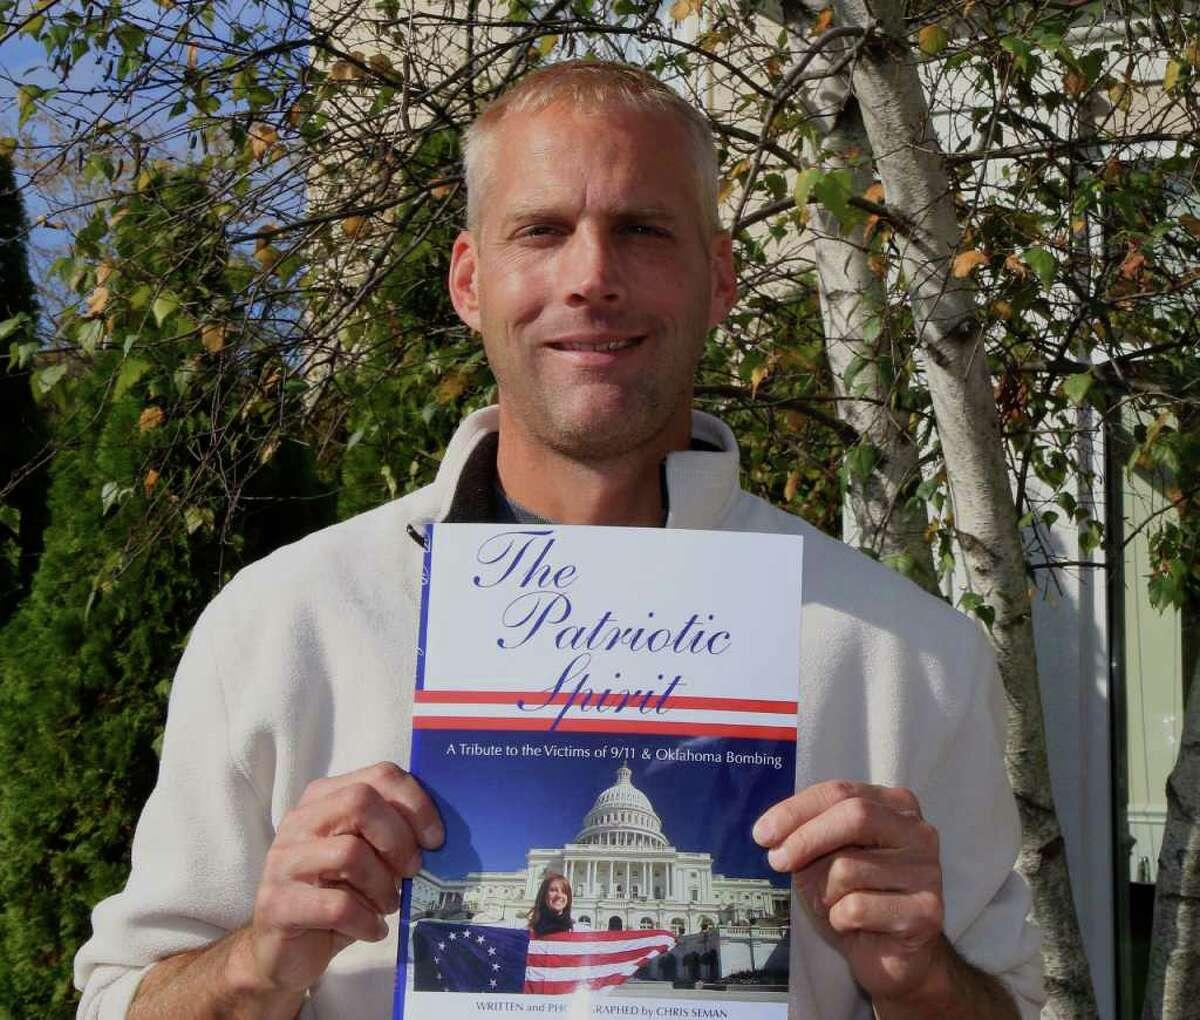 Chris Seman has self-published,